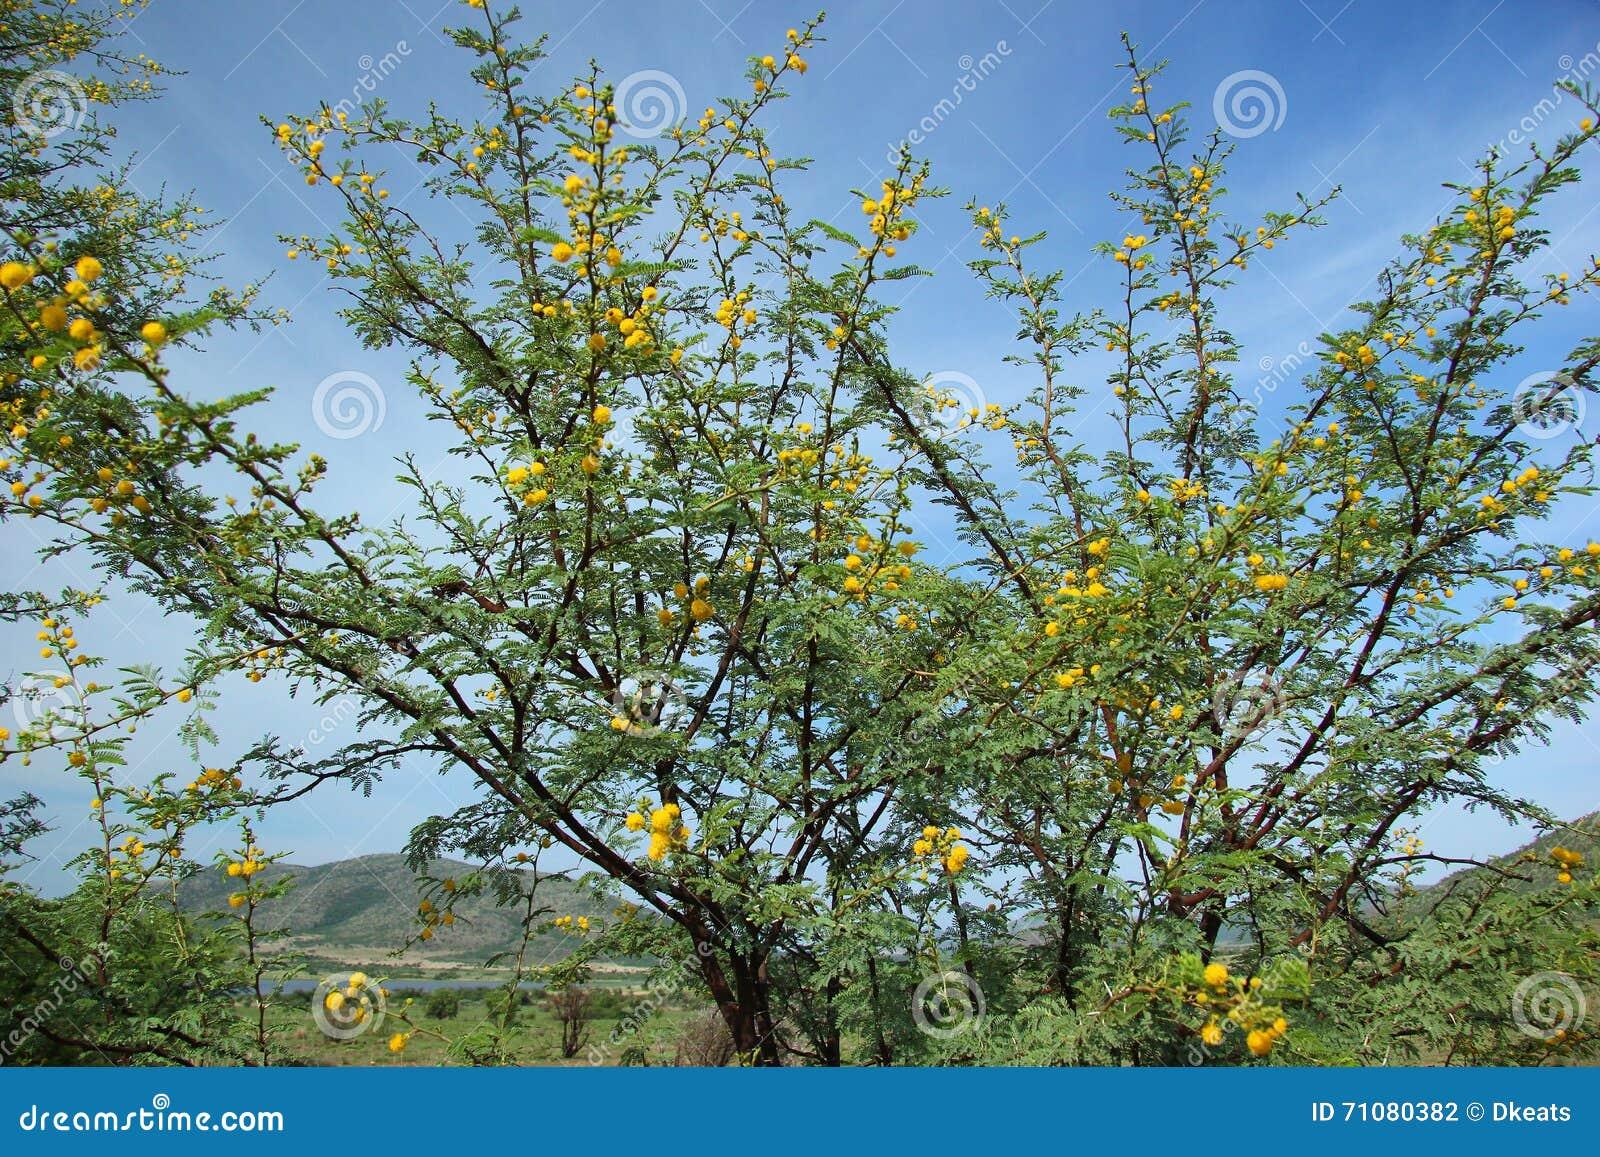 Sweet Thorn Acacia Karroo Stock Photo Image Of Acacia 71080382